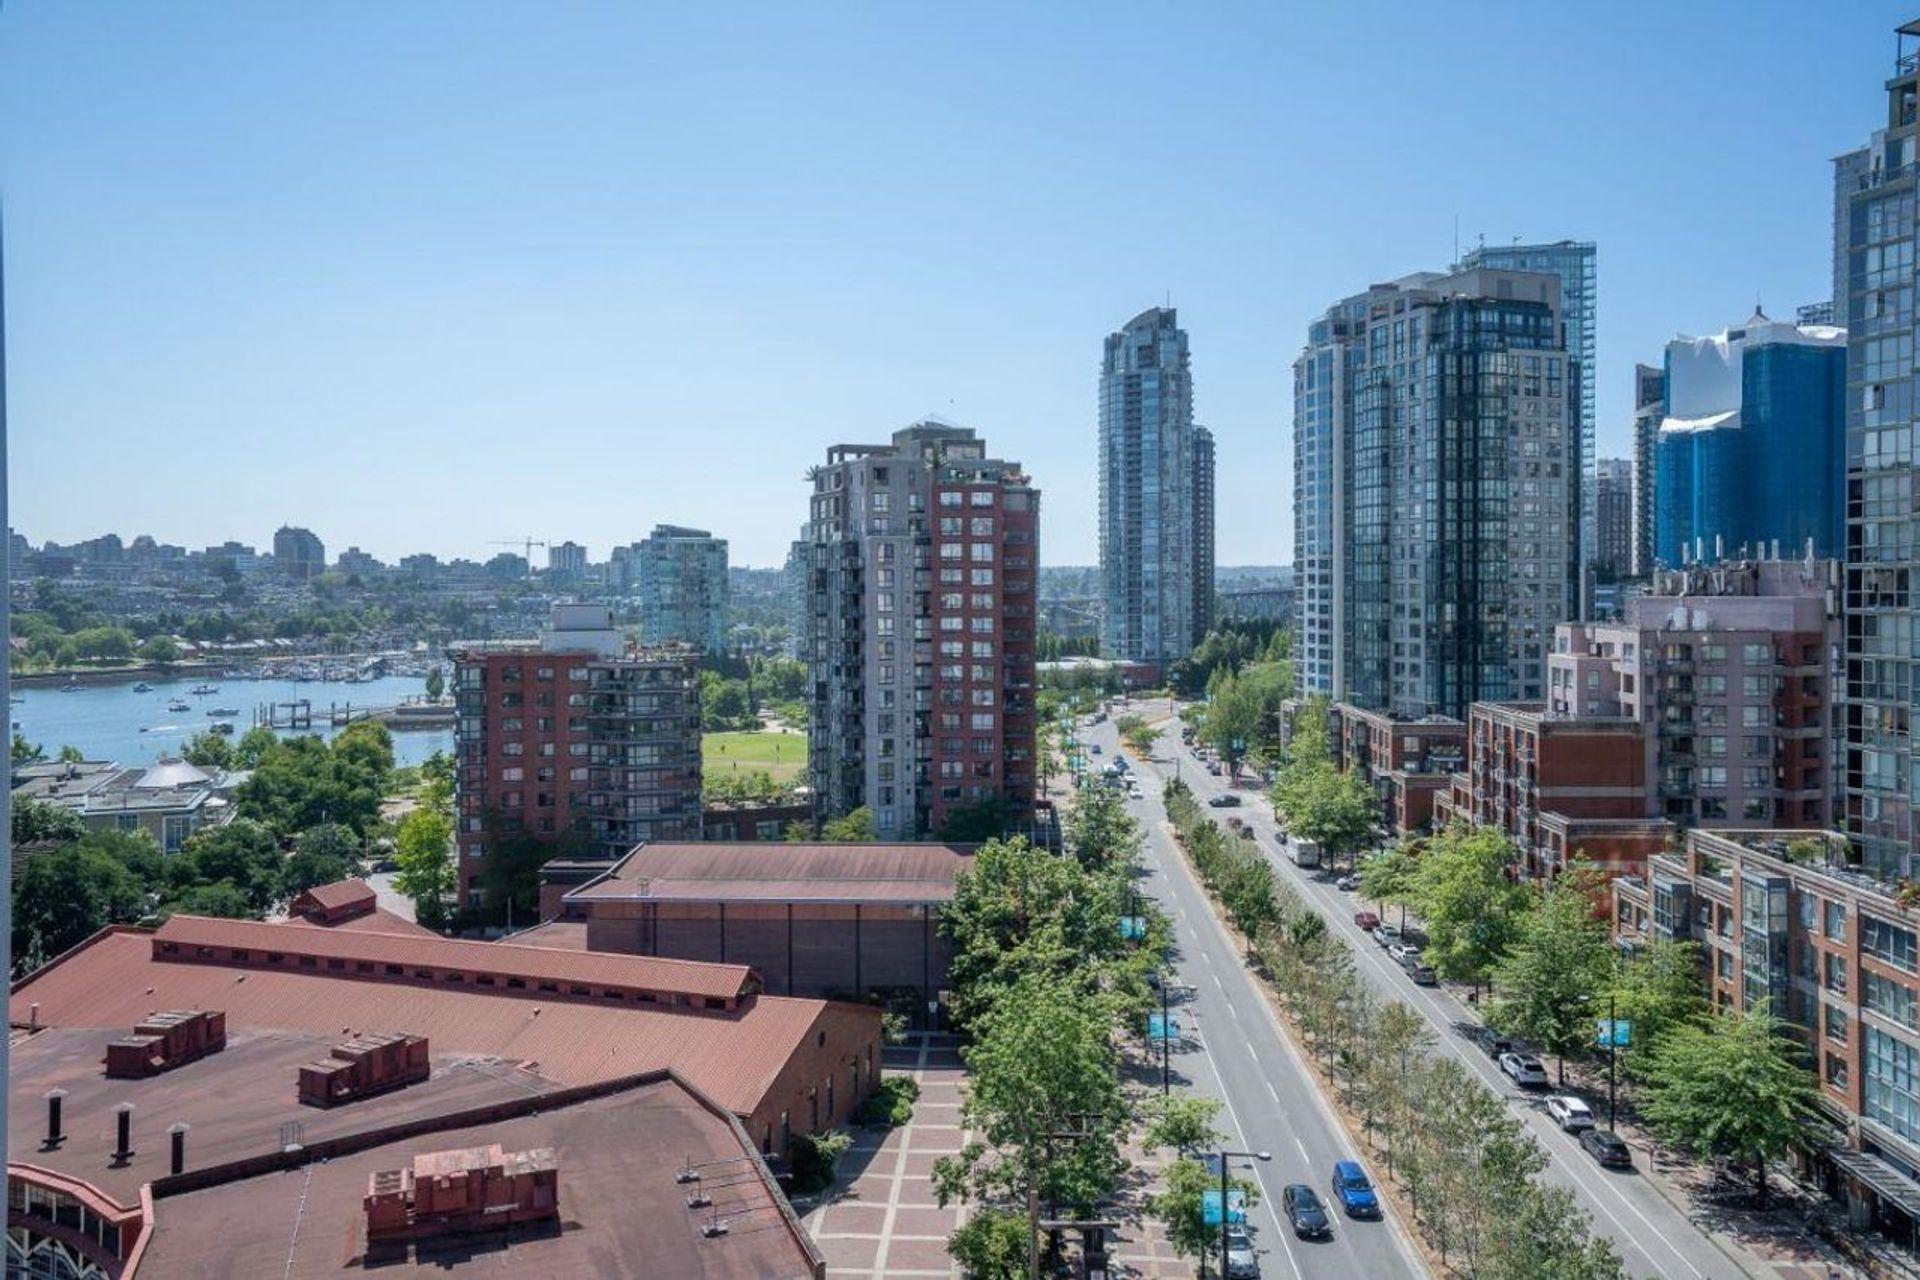 189-davie-street-yaletown-vancouver-west-12 at 1601 - 189 Davie Street, Yaletown, Vancouver West